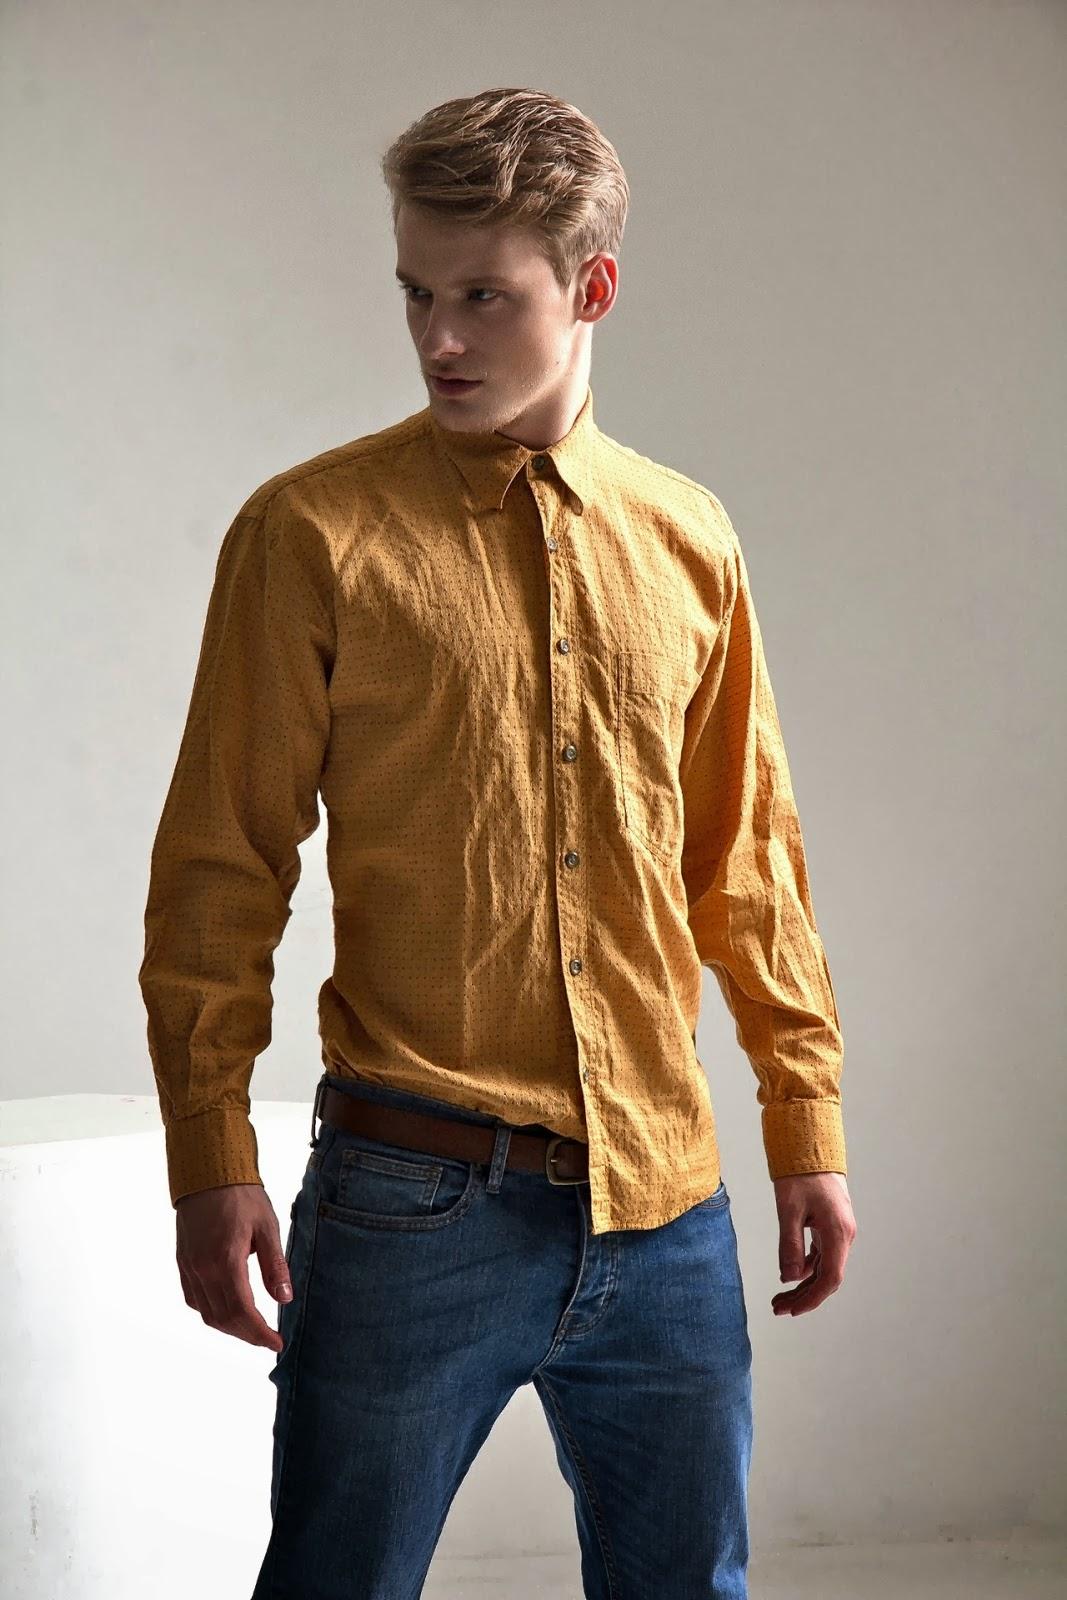 renan men 1-16 of over 1,000 results for ernest renan showing most relevant results see all results for ernest renan east dane designer men's fashion: fabric sewing.